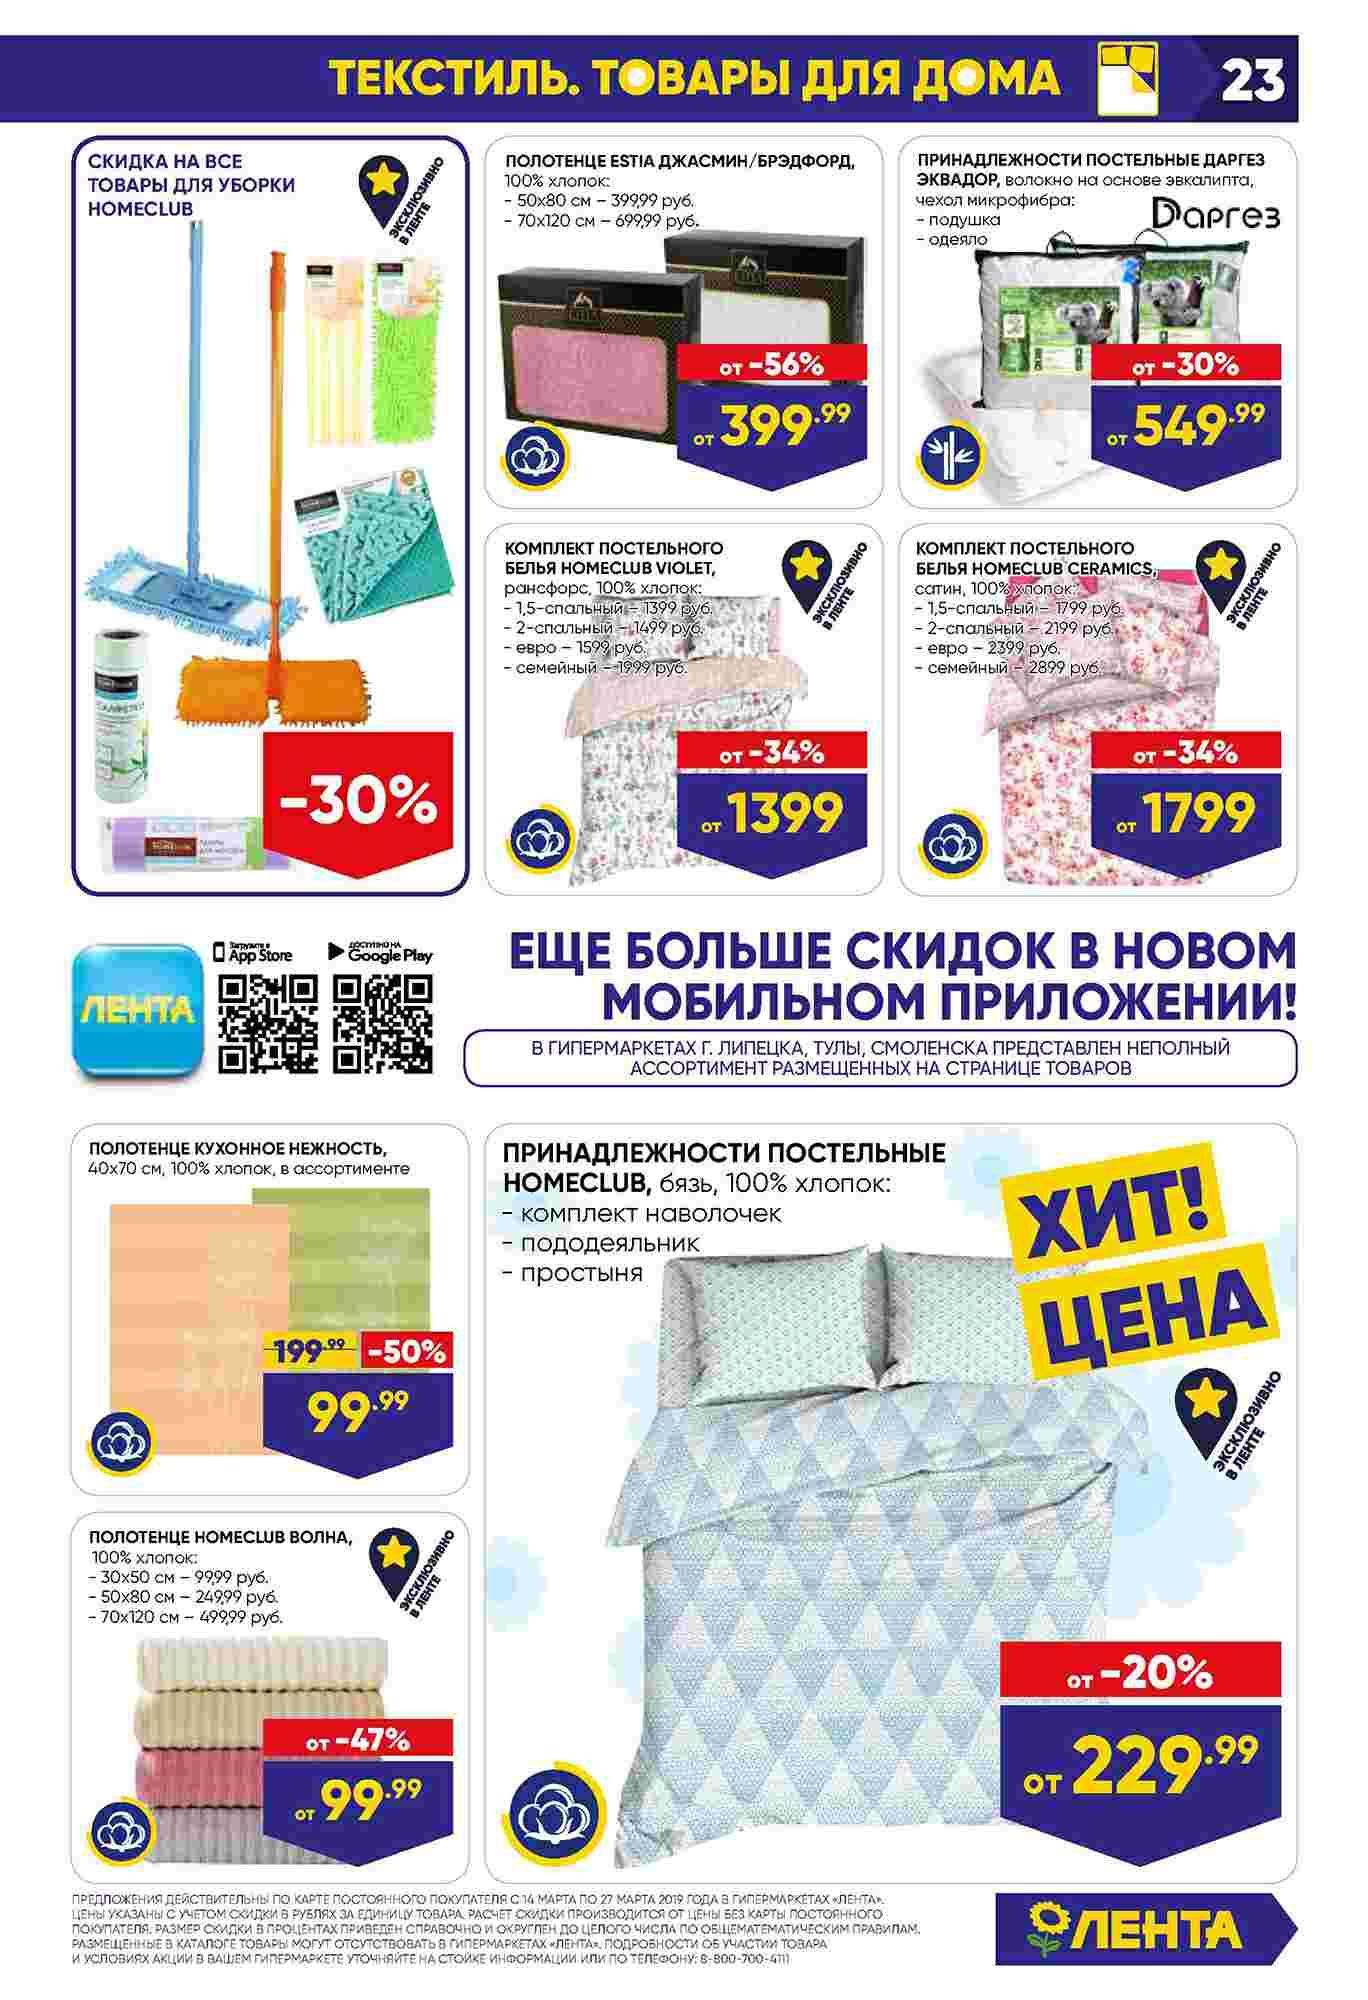 Каталог Лента гипермаркет 14-27.03.2019 стр. - 0001 - 0023